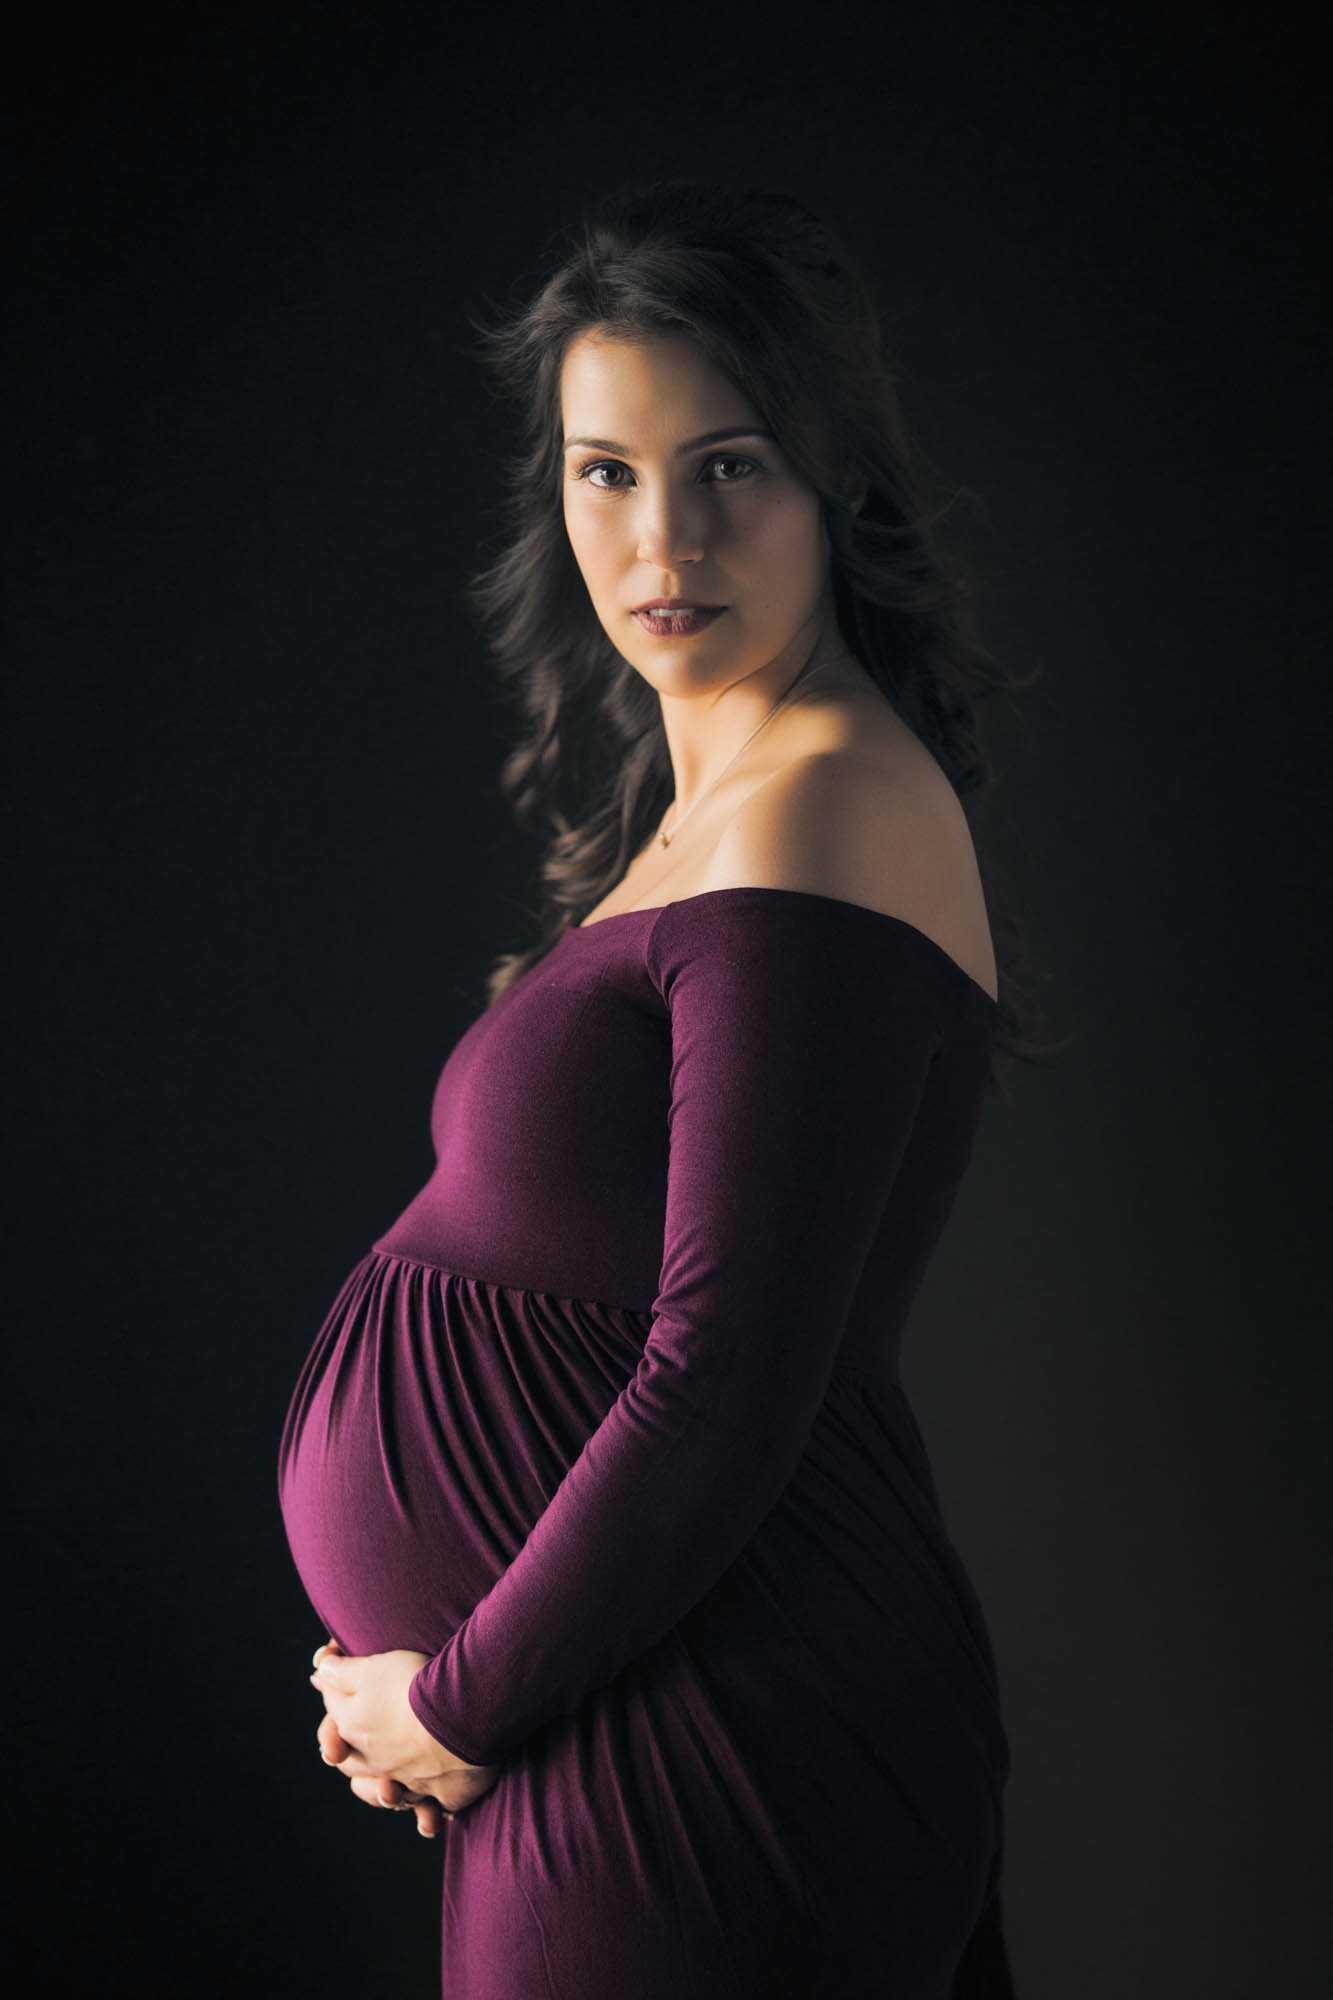 Maternity photo shoot for Jenn by Jason Guy